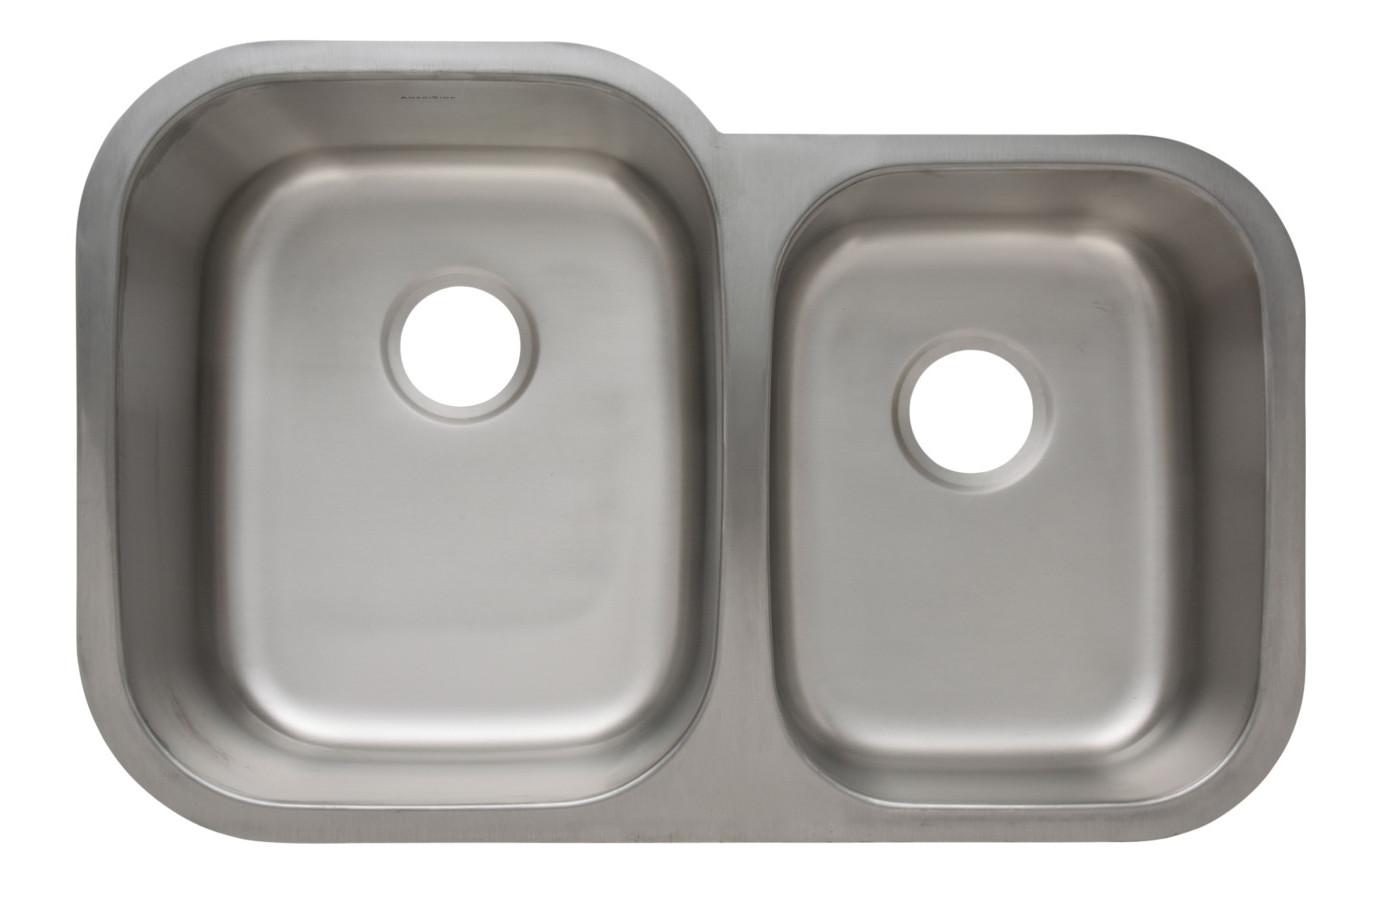 kitchen sink           as1206 32   x 21   x 5 4   5 4   18g double bowl undermount economy      rh   amerisink com